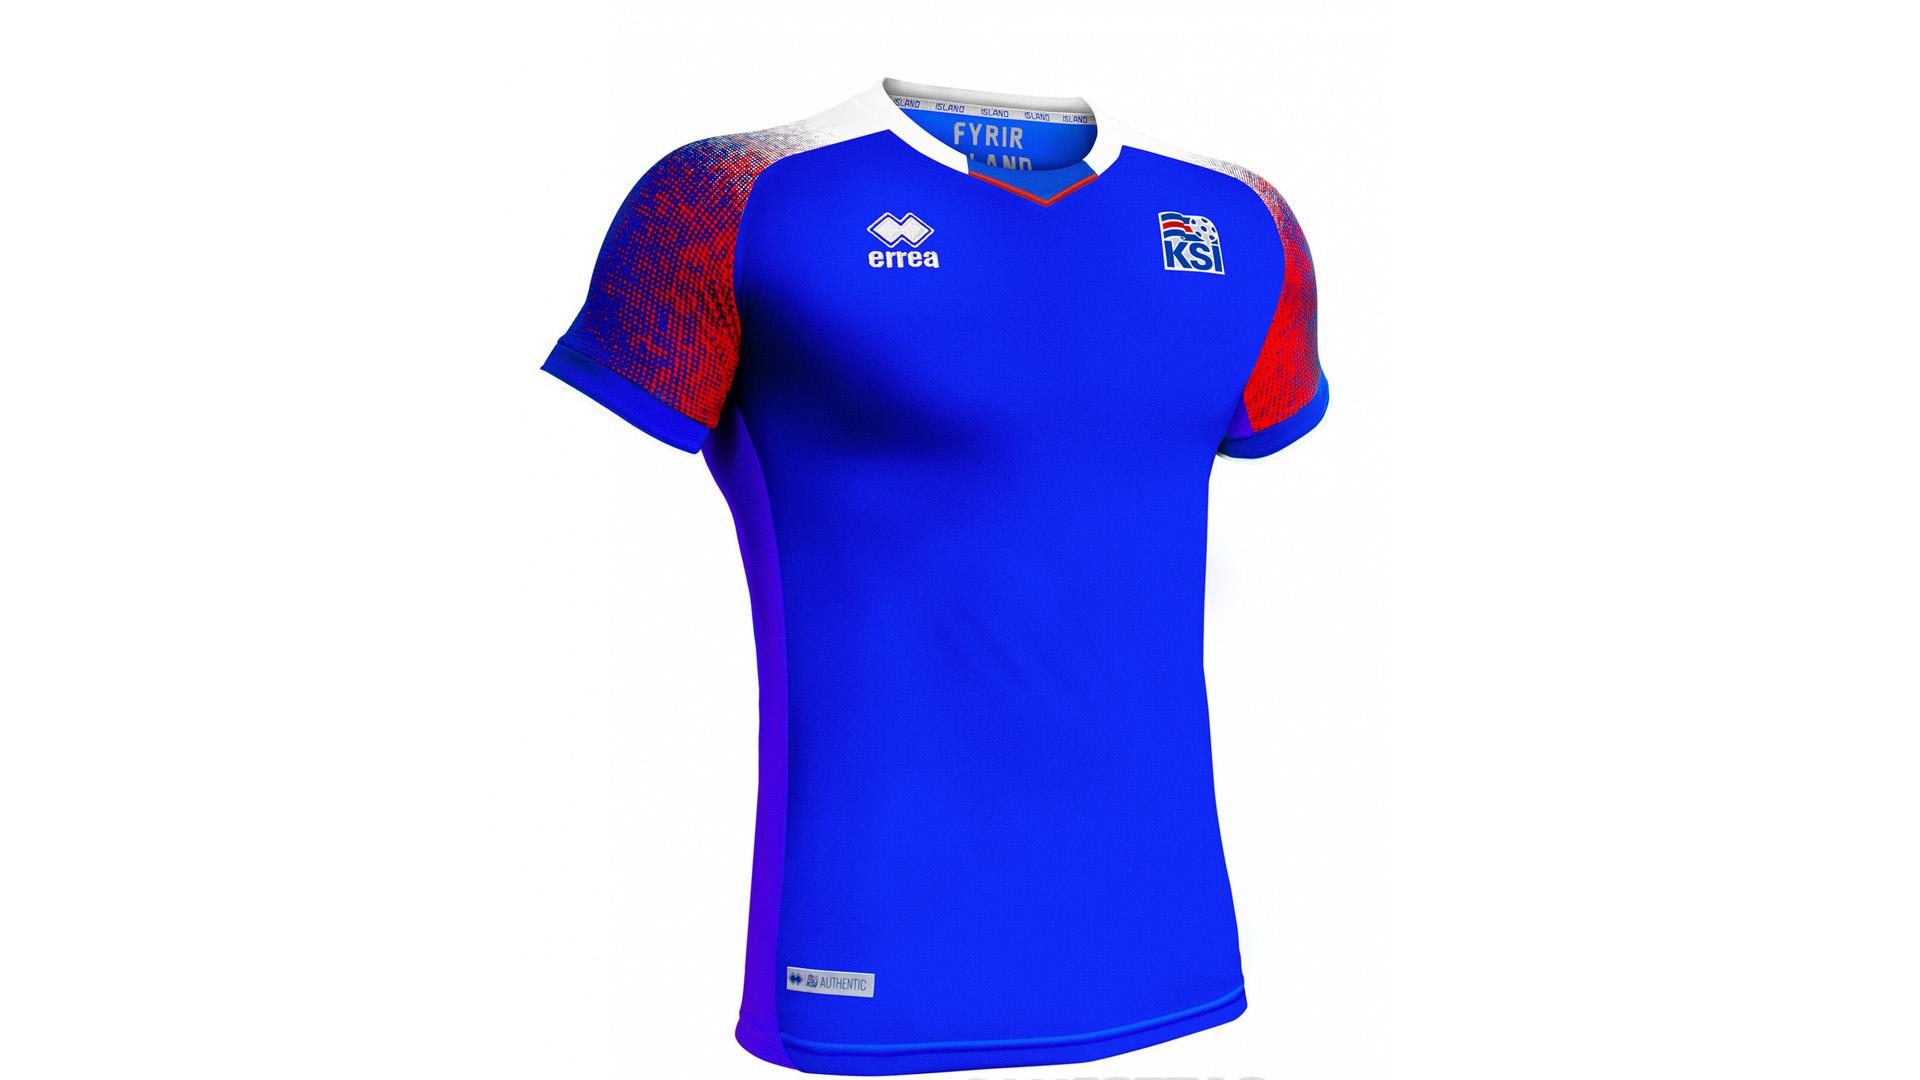 Islandia Camiseta Titula 2018 Iceland Home Kit